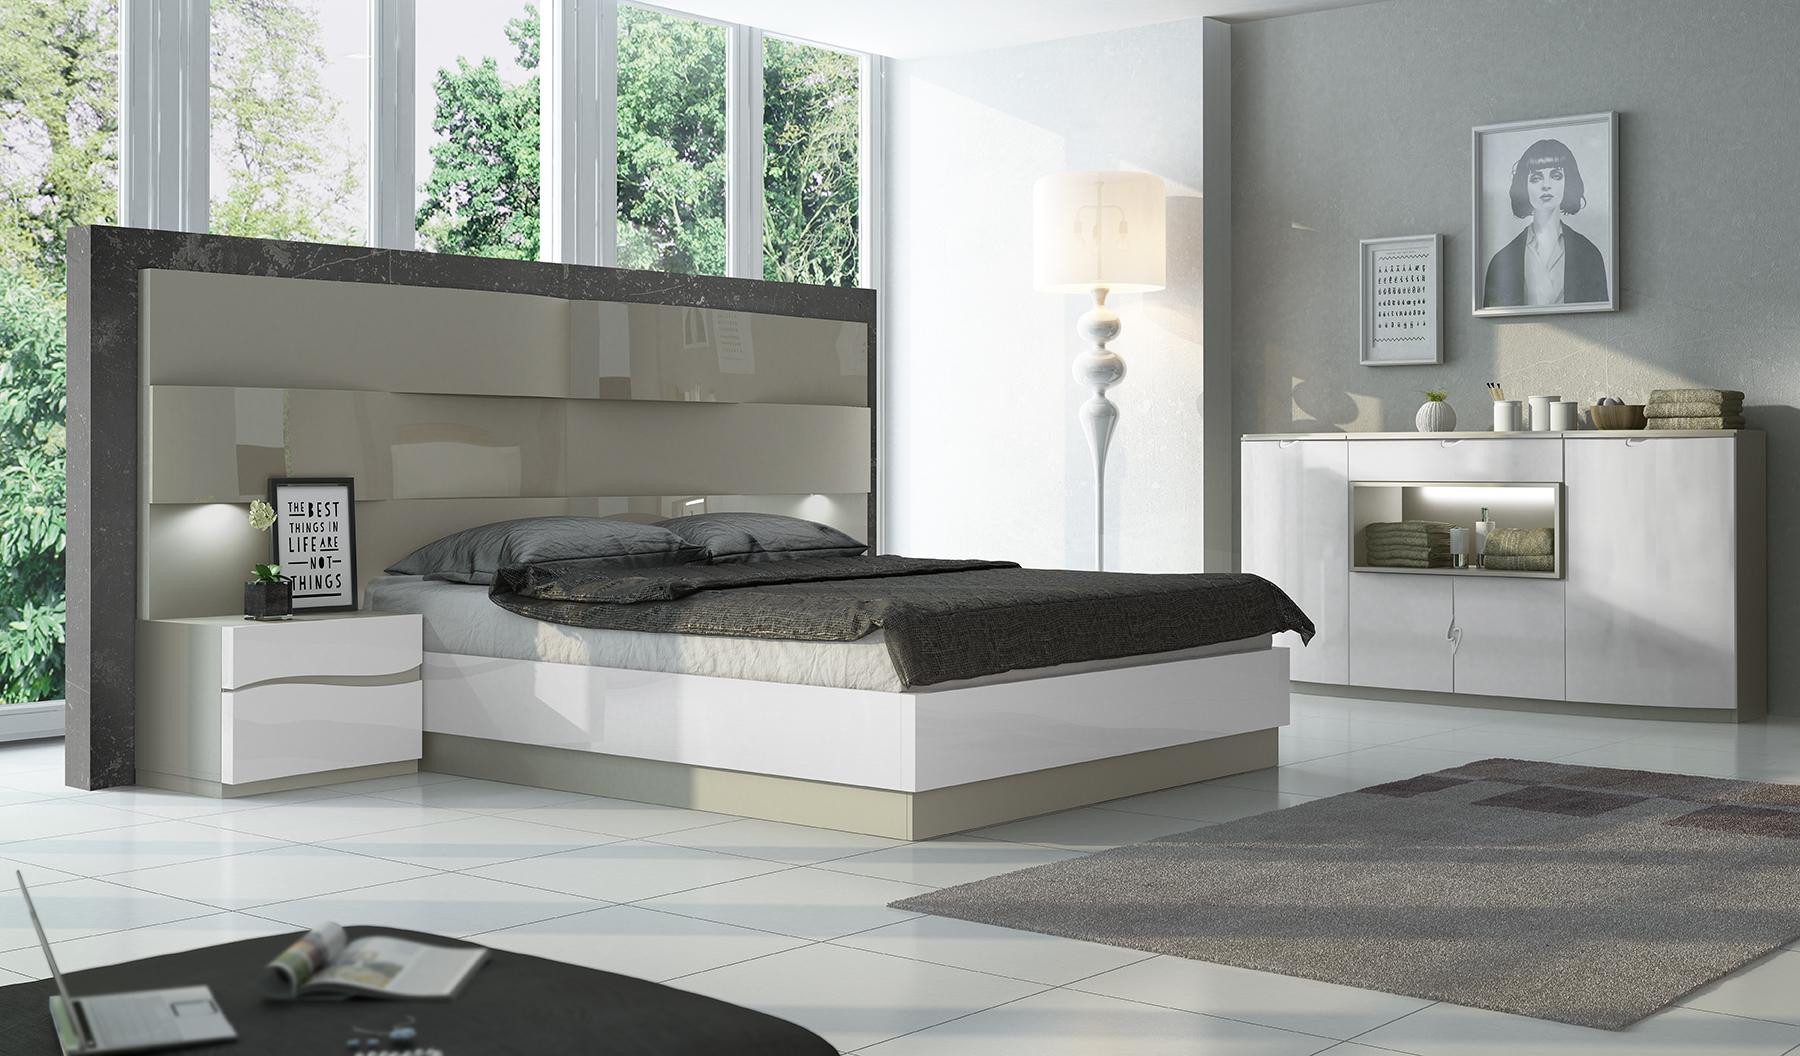 Fenicia Composition 21 / comp 601, Fenicia Modern Bedroom Sets ...